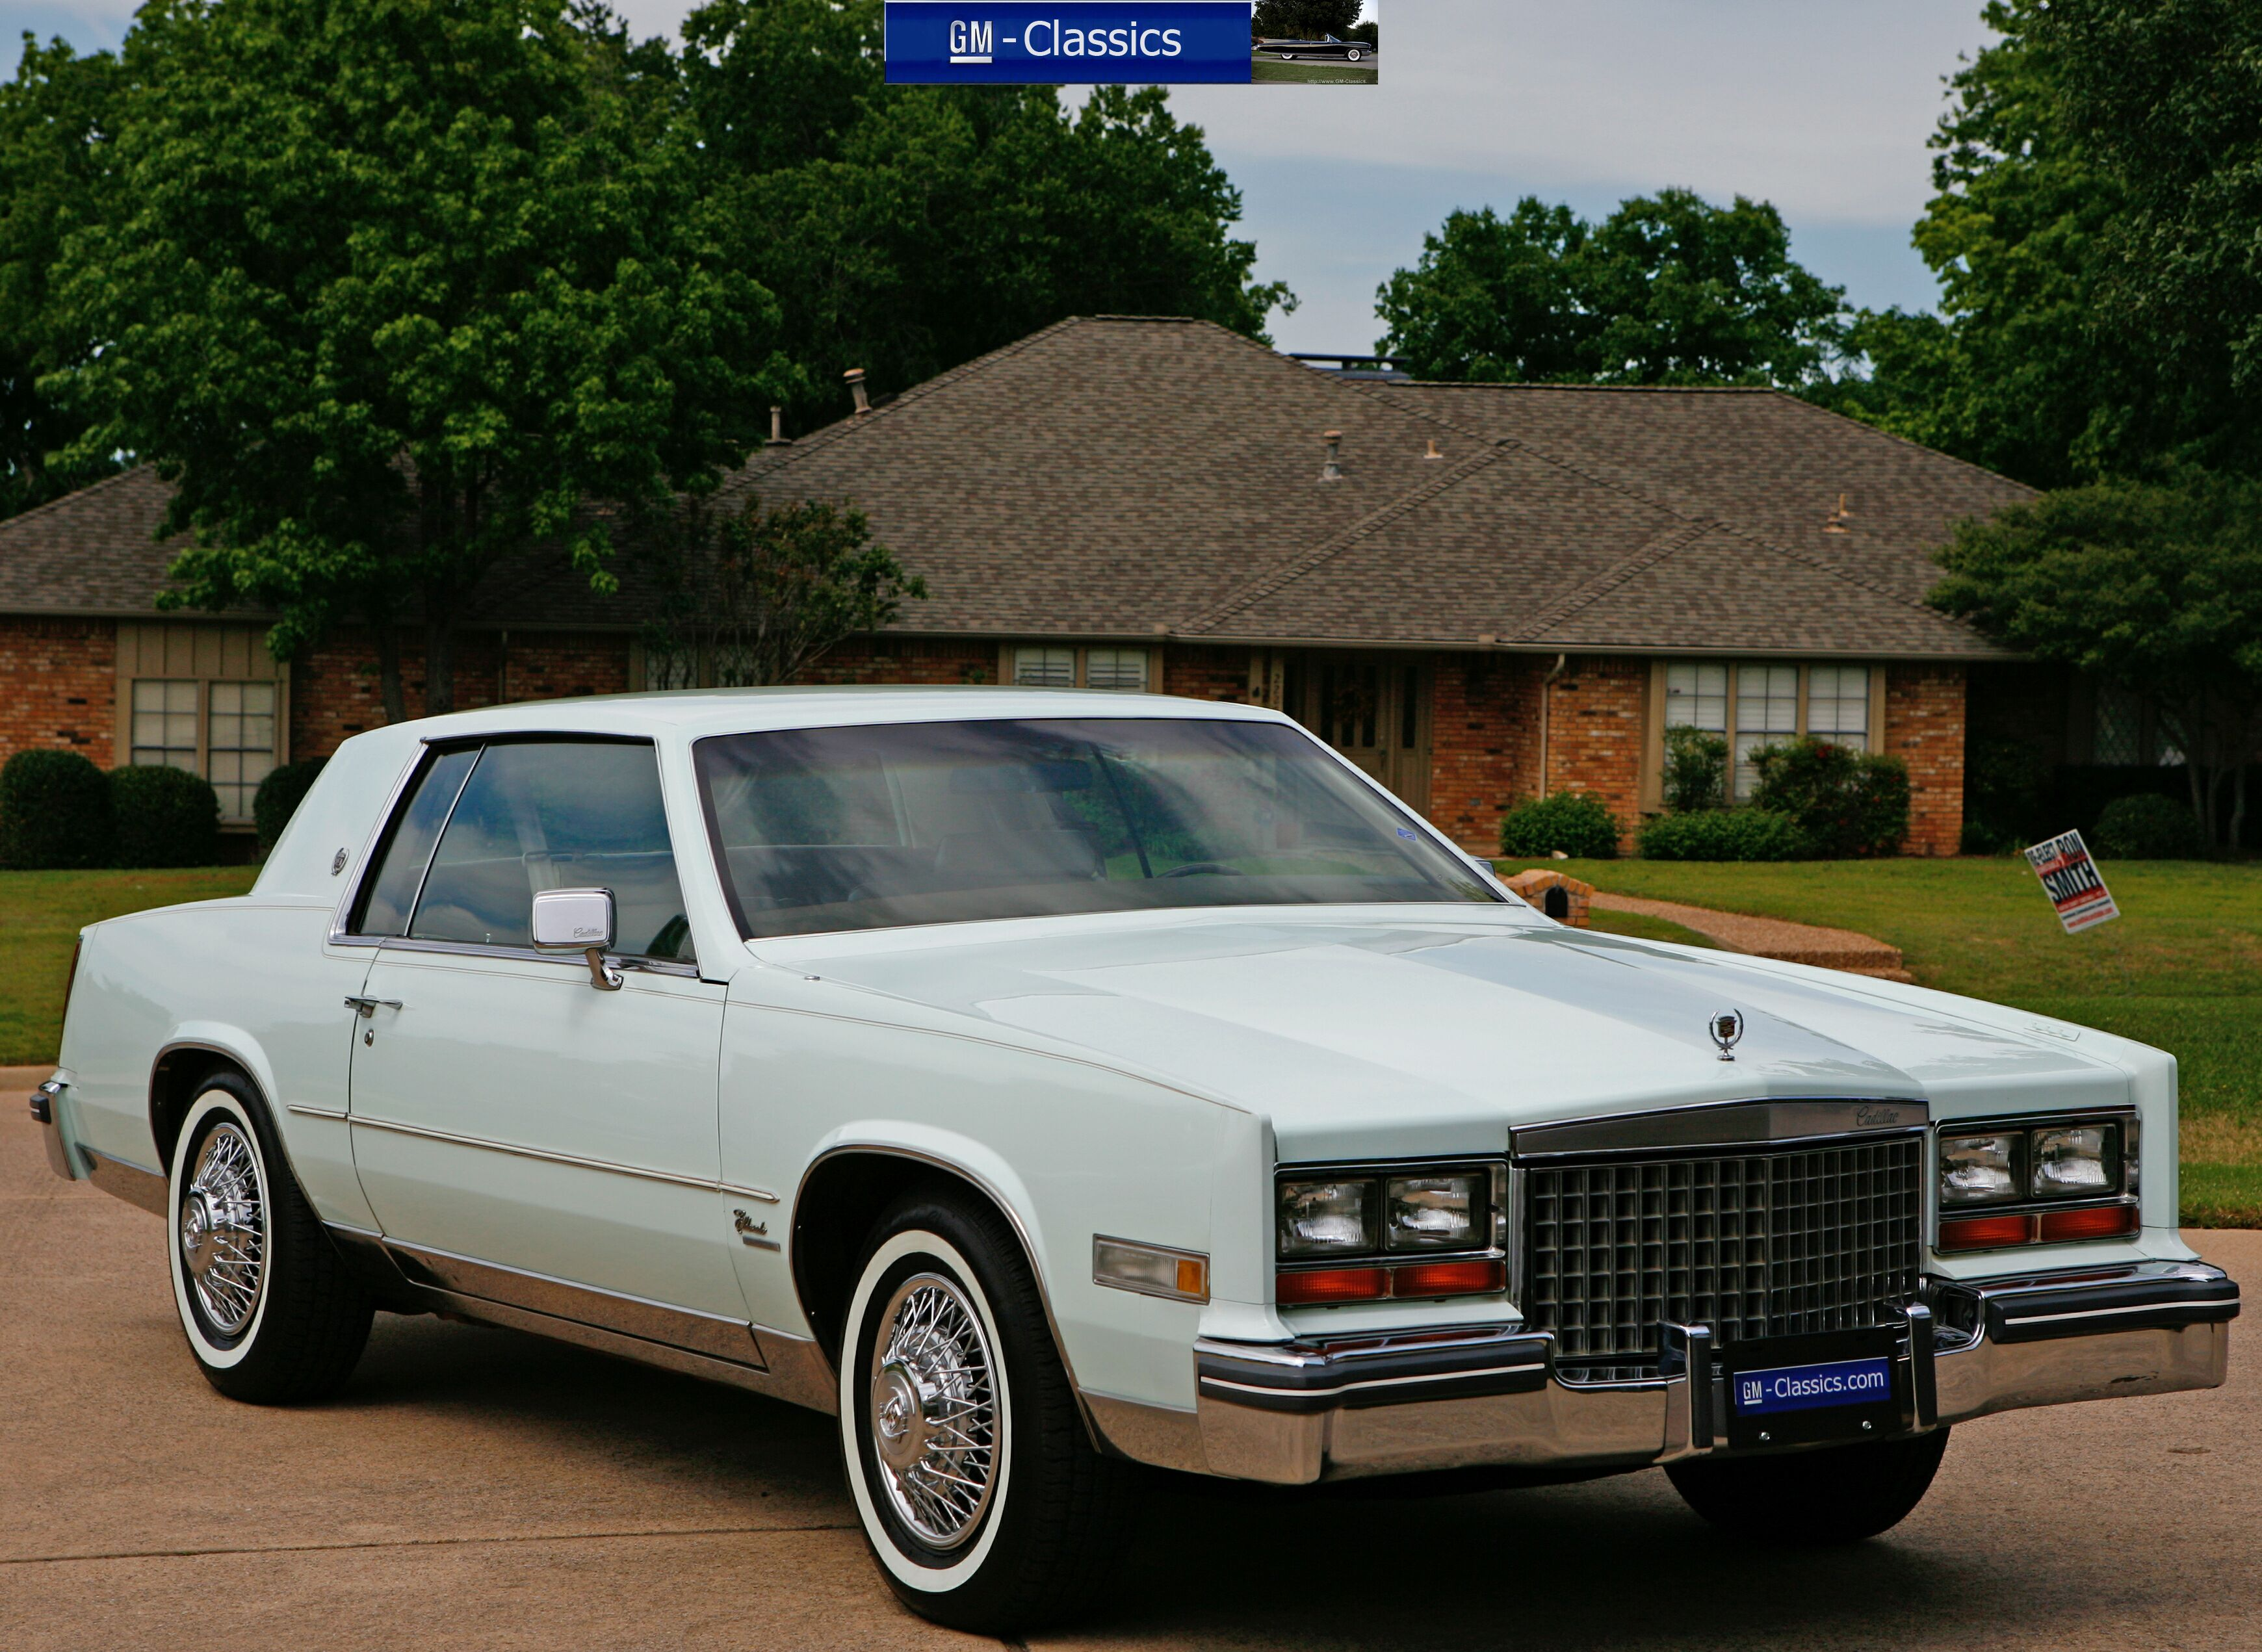 1980 Cadillac Eldorado Touring Coupe - Matt Garrett